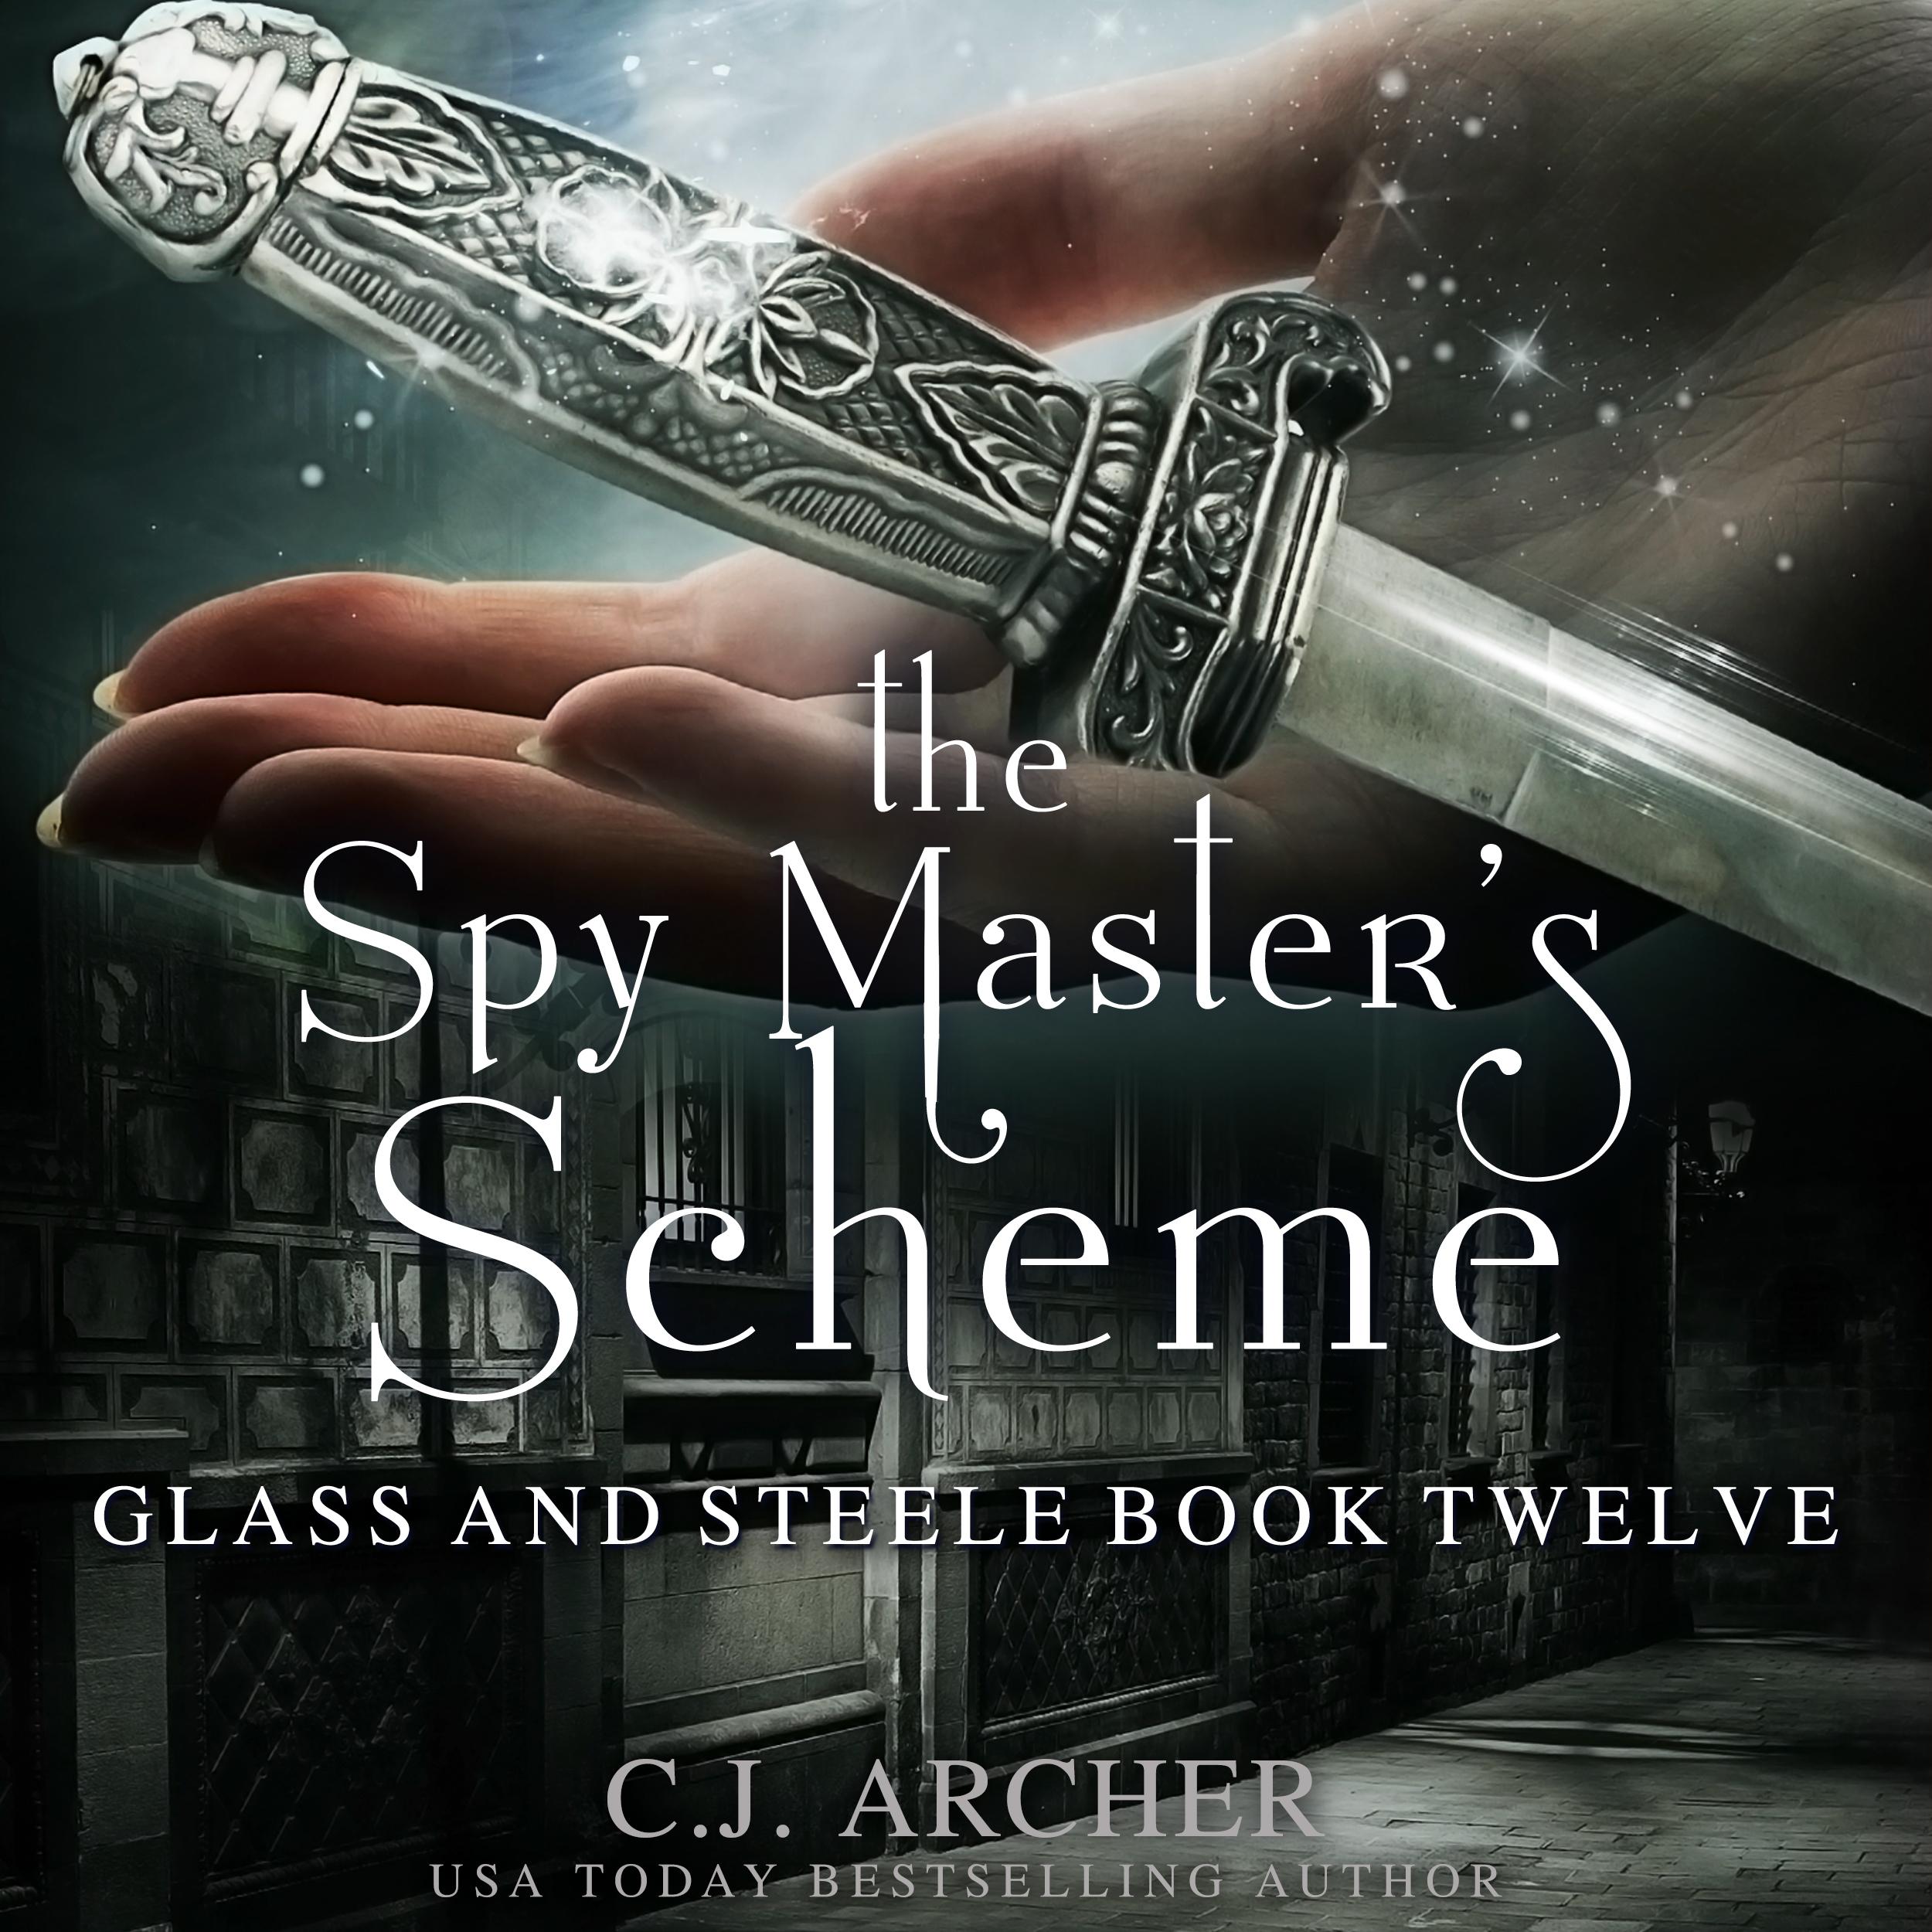 The Spy Master's Scheme audiobook by CJ Archer